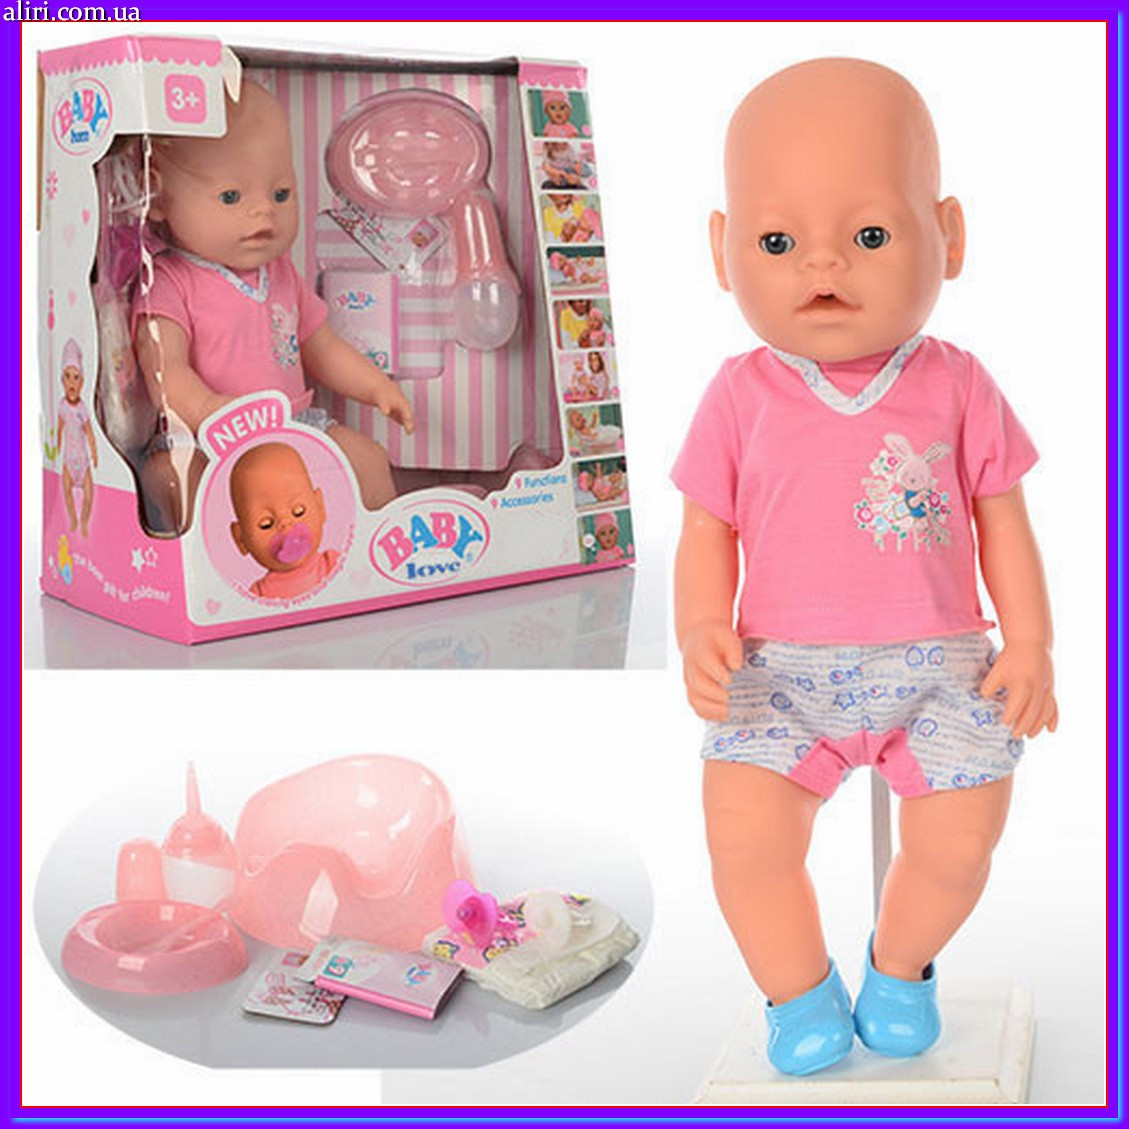 Кукла пупс 42 см с аксессуарами BB 8009-435 аналог Беби Борна